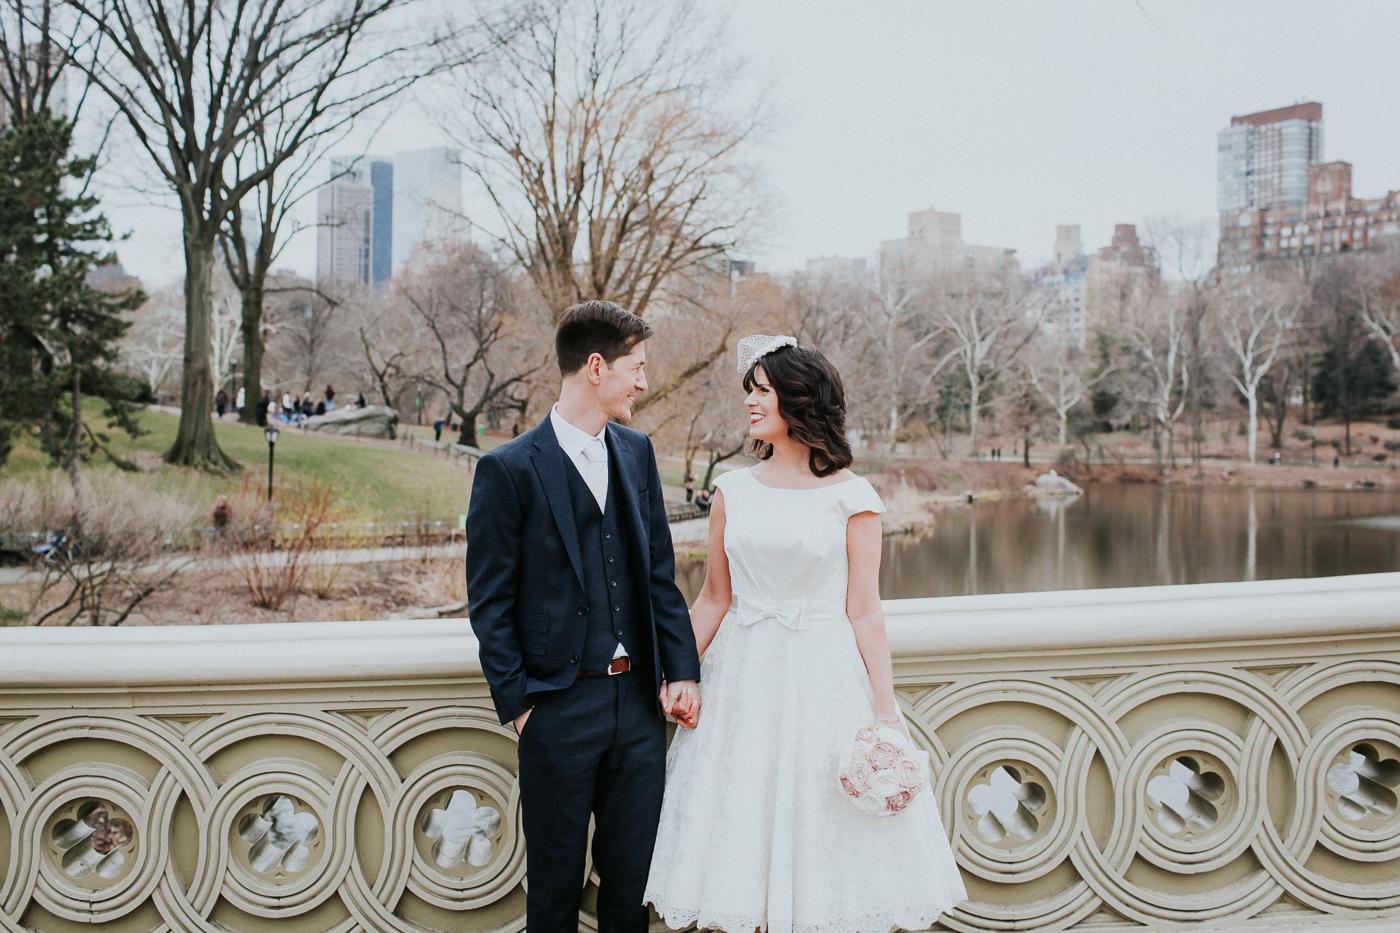 Ladies-Pavilion-Central-Park-NYC-Documentary-Elopement-Wedding-Photographer-52.jpg